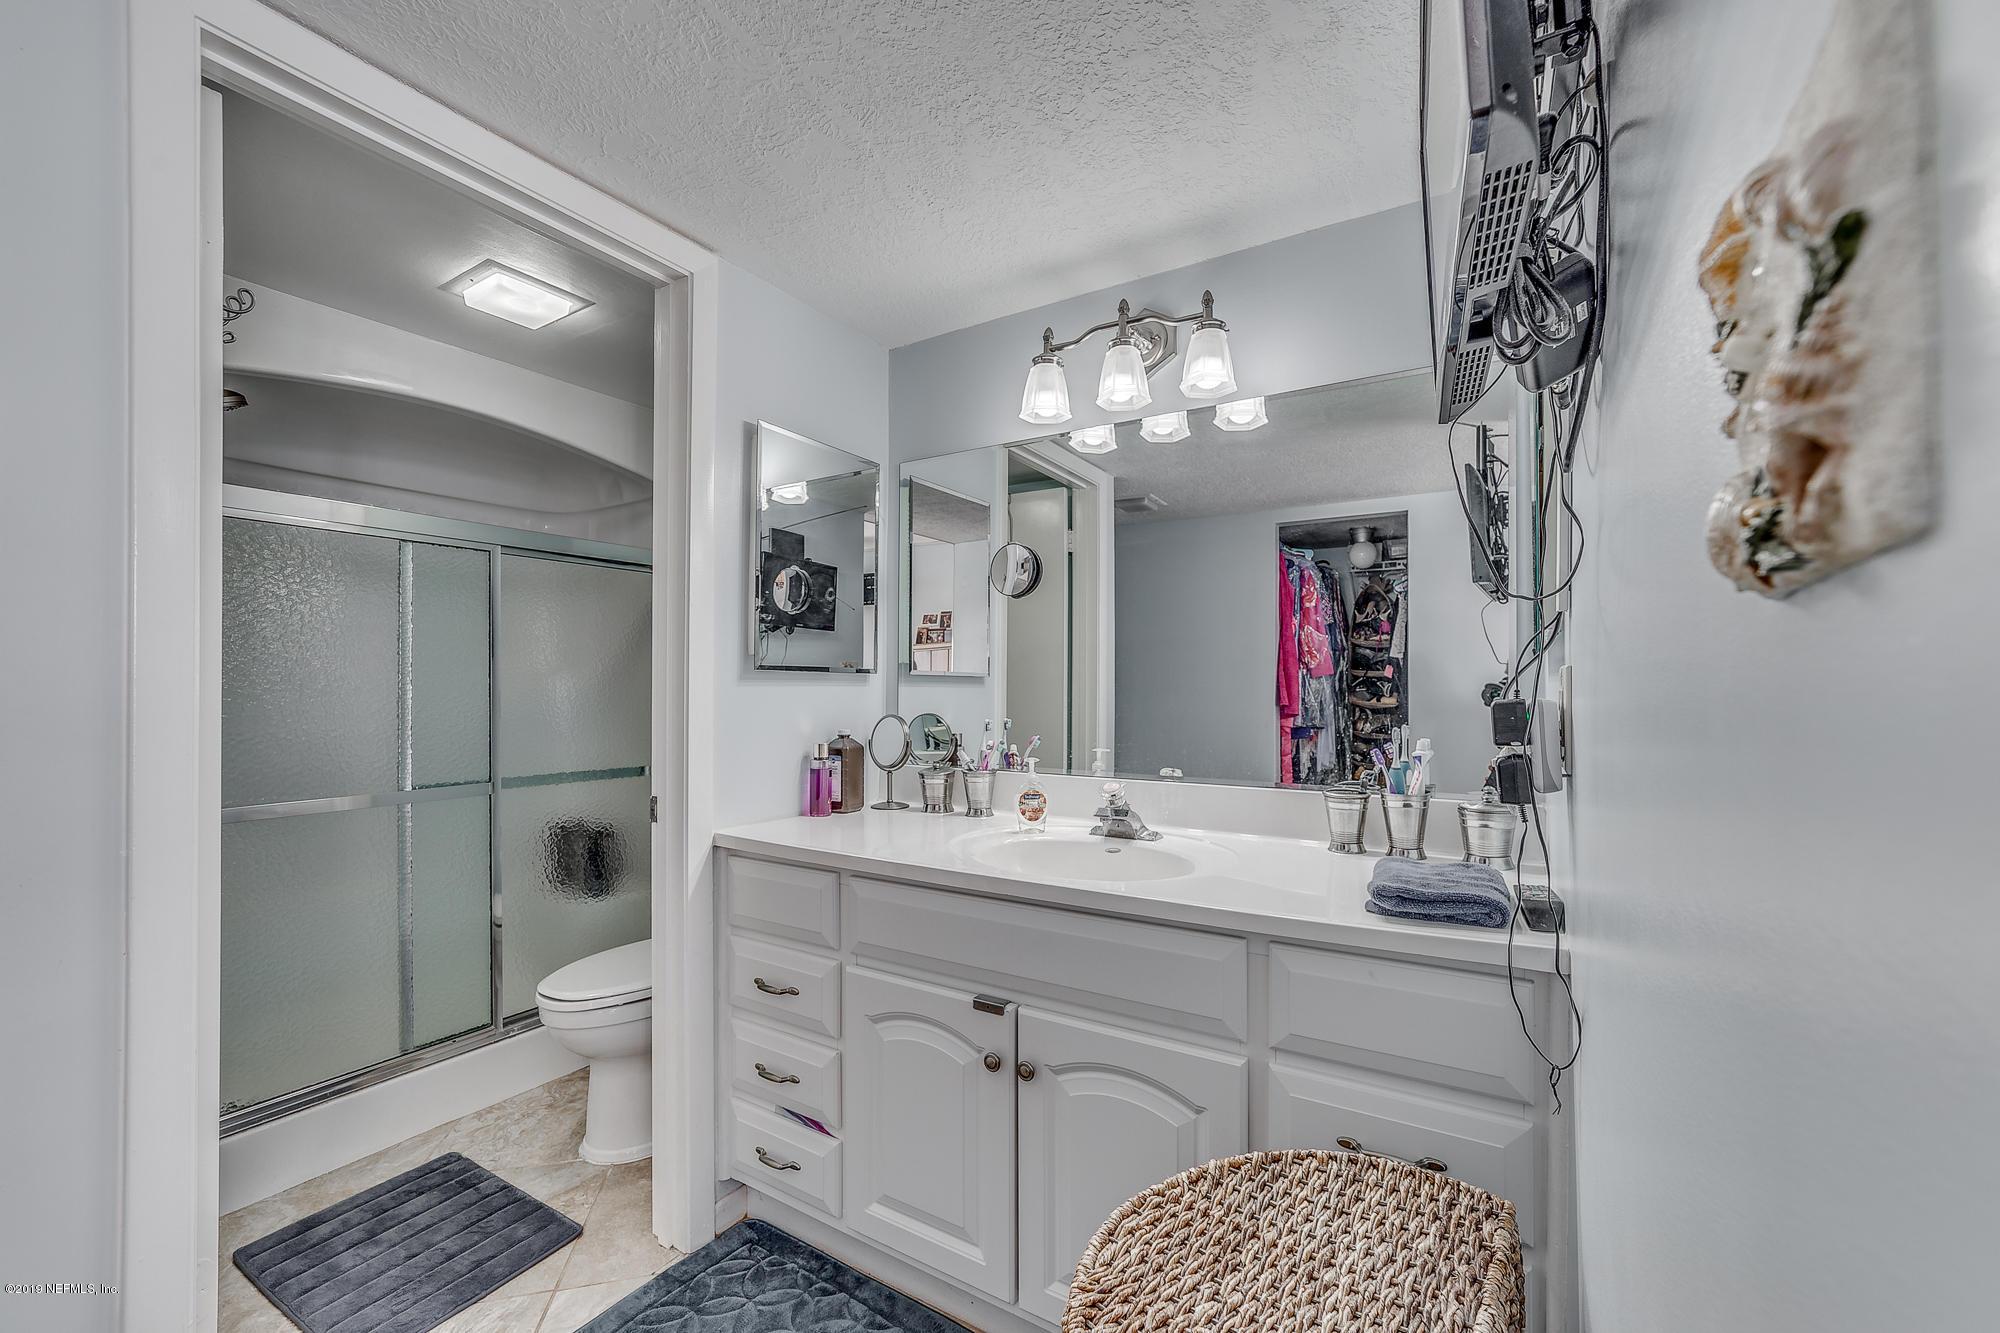 1301 1ST, JACKSONVILLE BEACH, FLORIDA 32250, 2 Bedrooms Bedrooms, ,2 BathroomsBathrooms,Condo,For sale,1ST,1014013